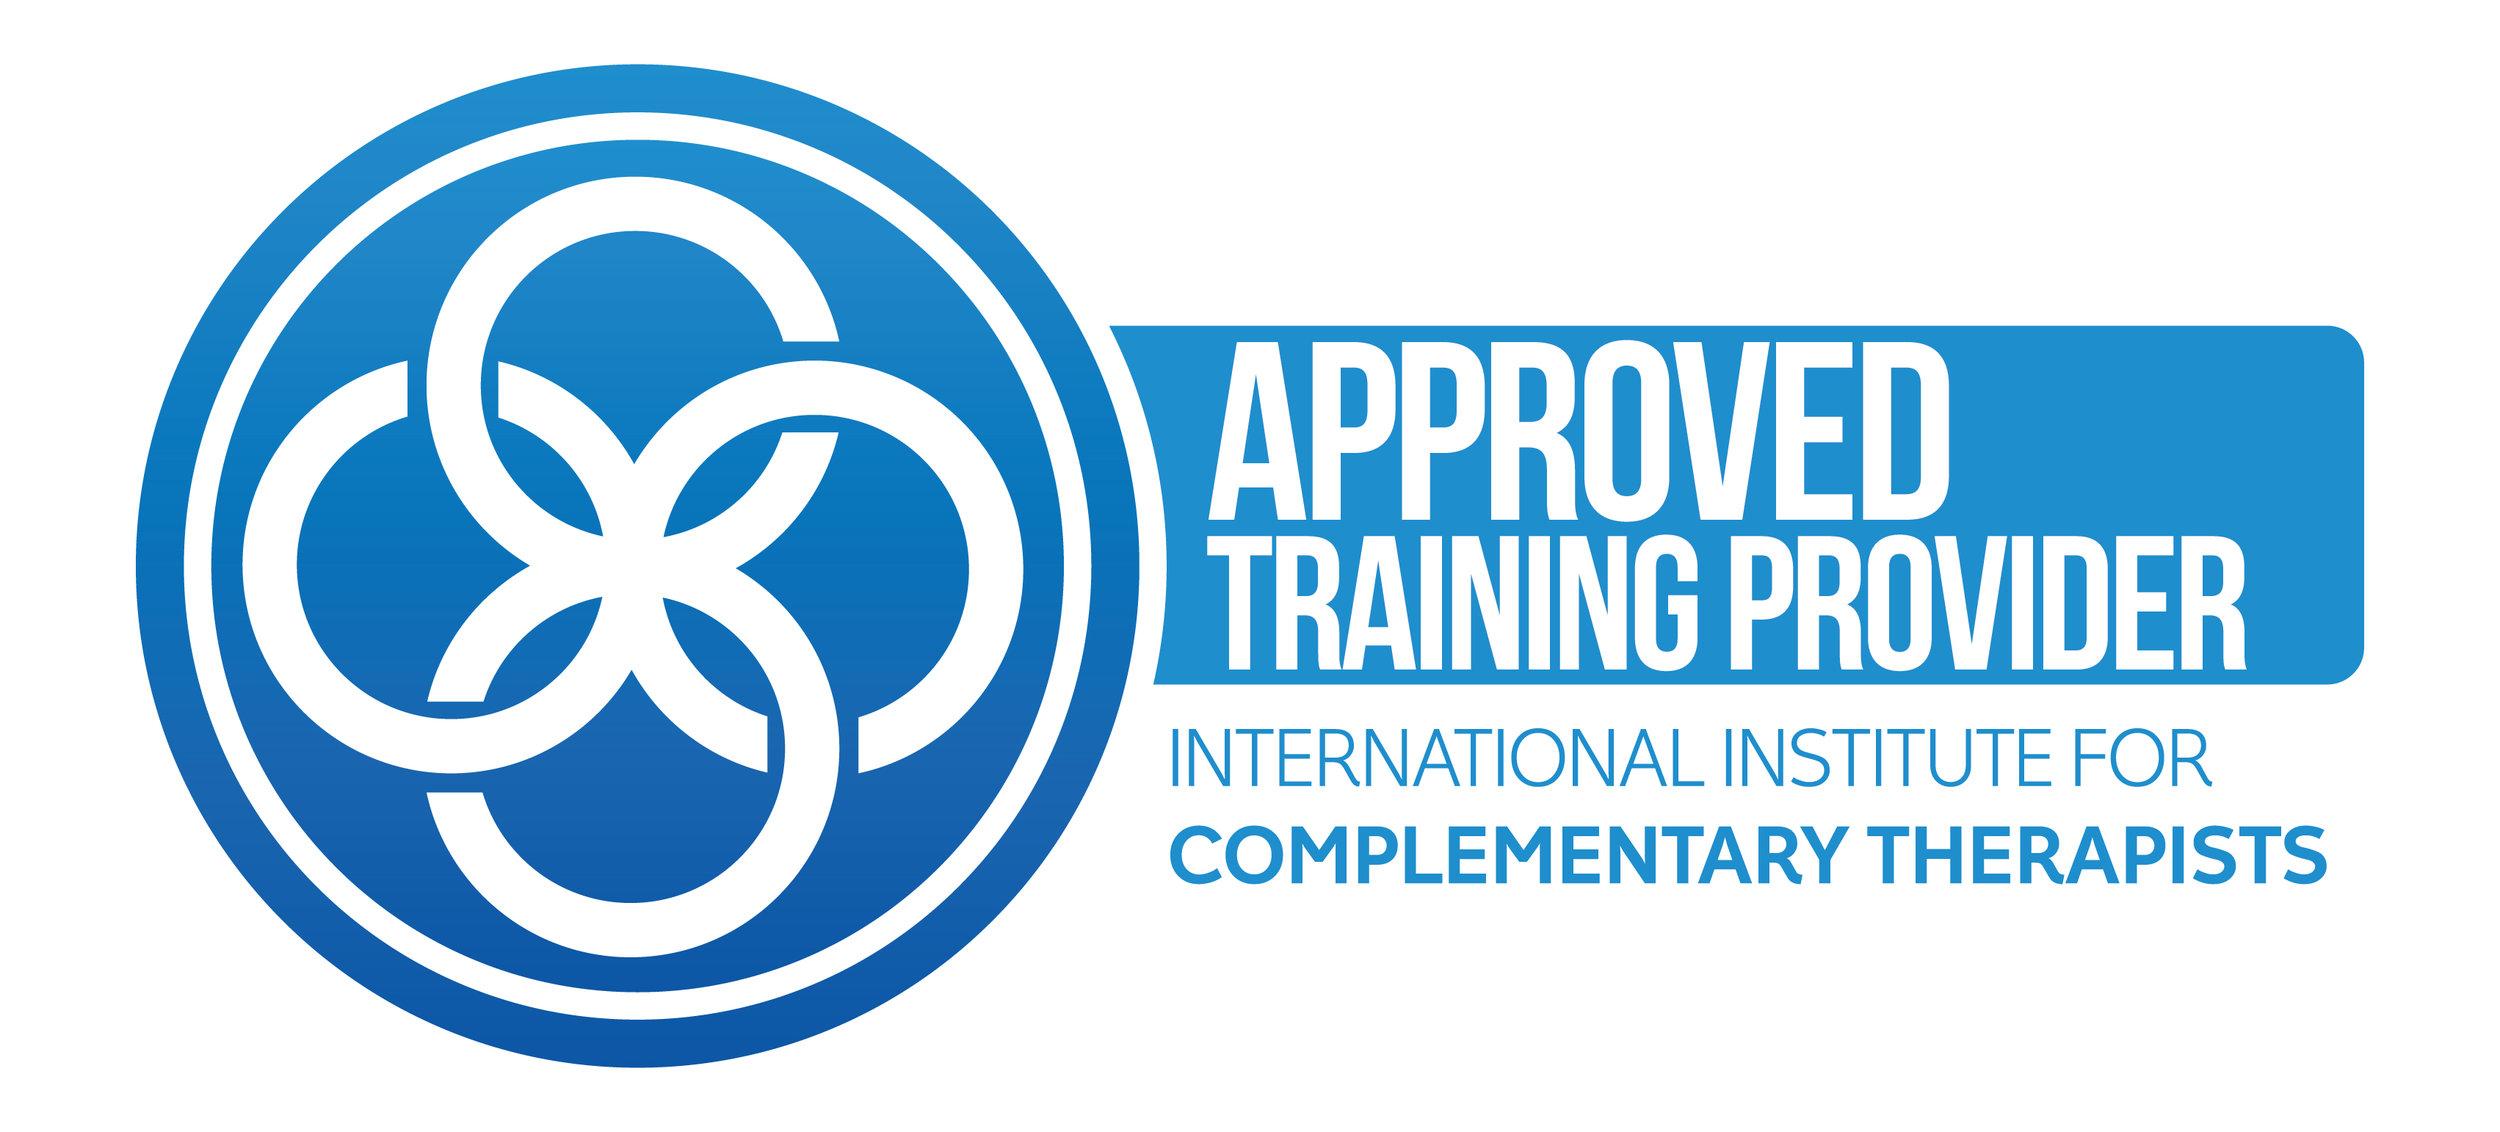 IICT ATP Logo3 copy.jpg